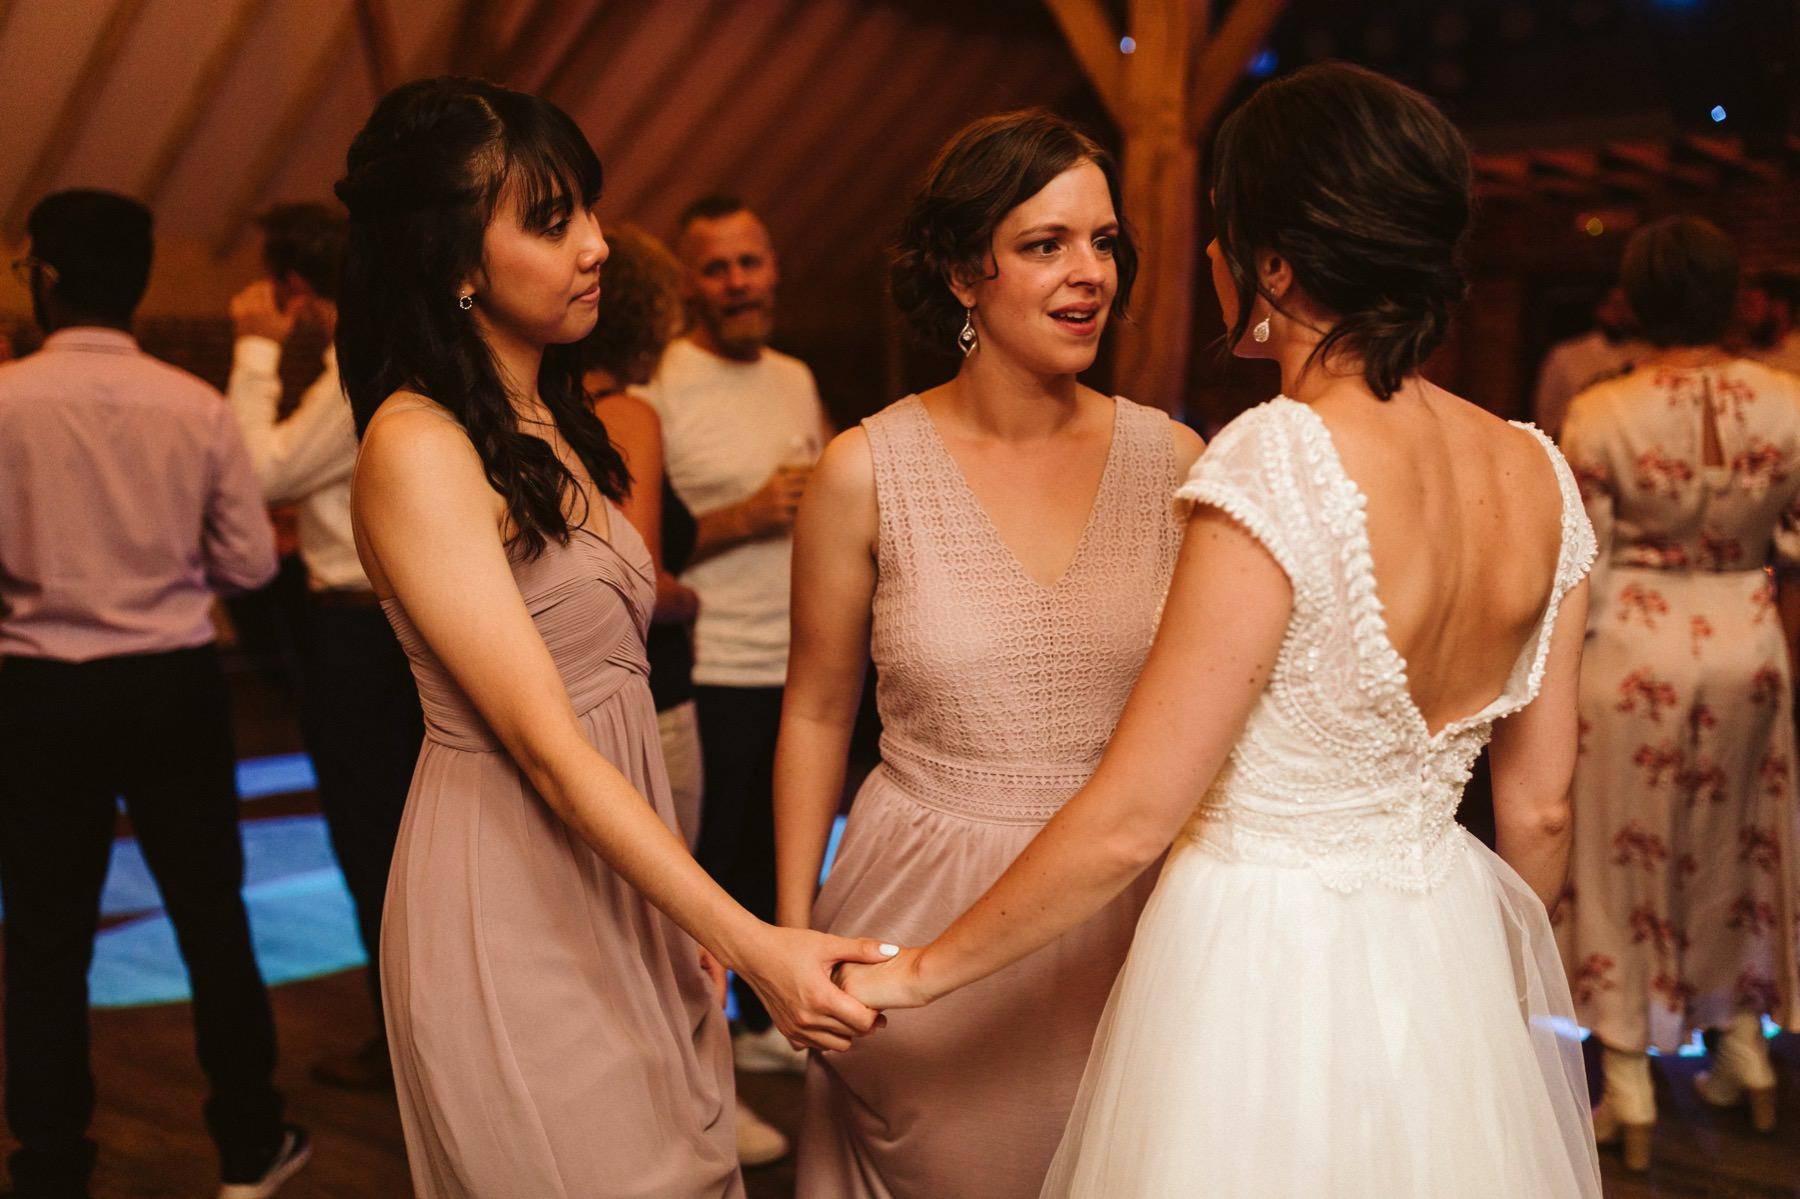 Belgium wedding party